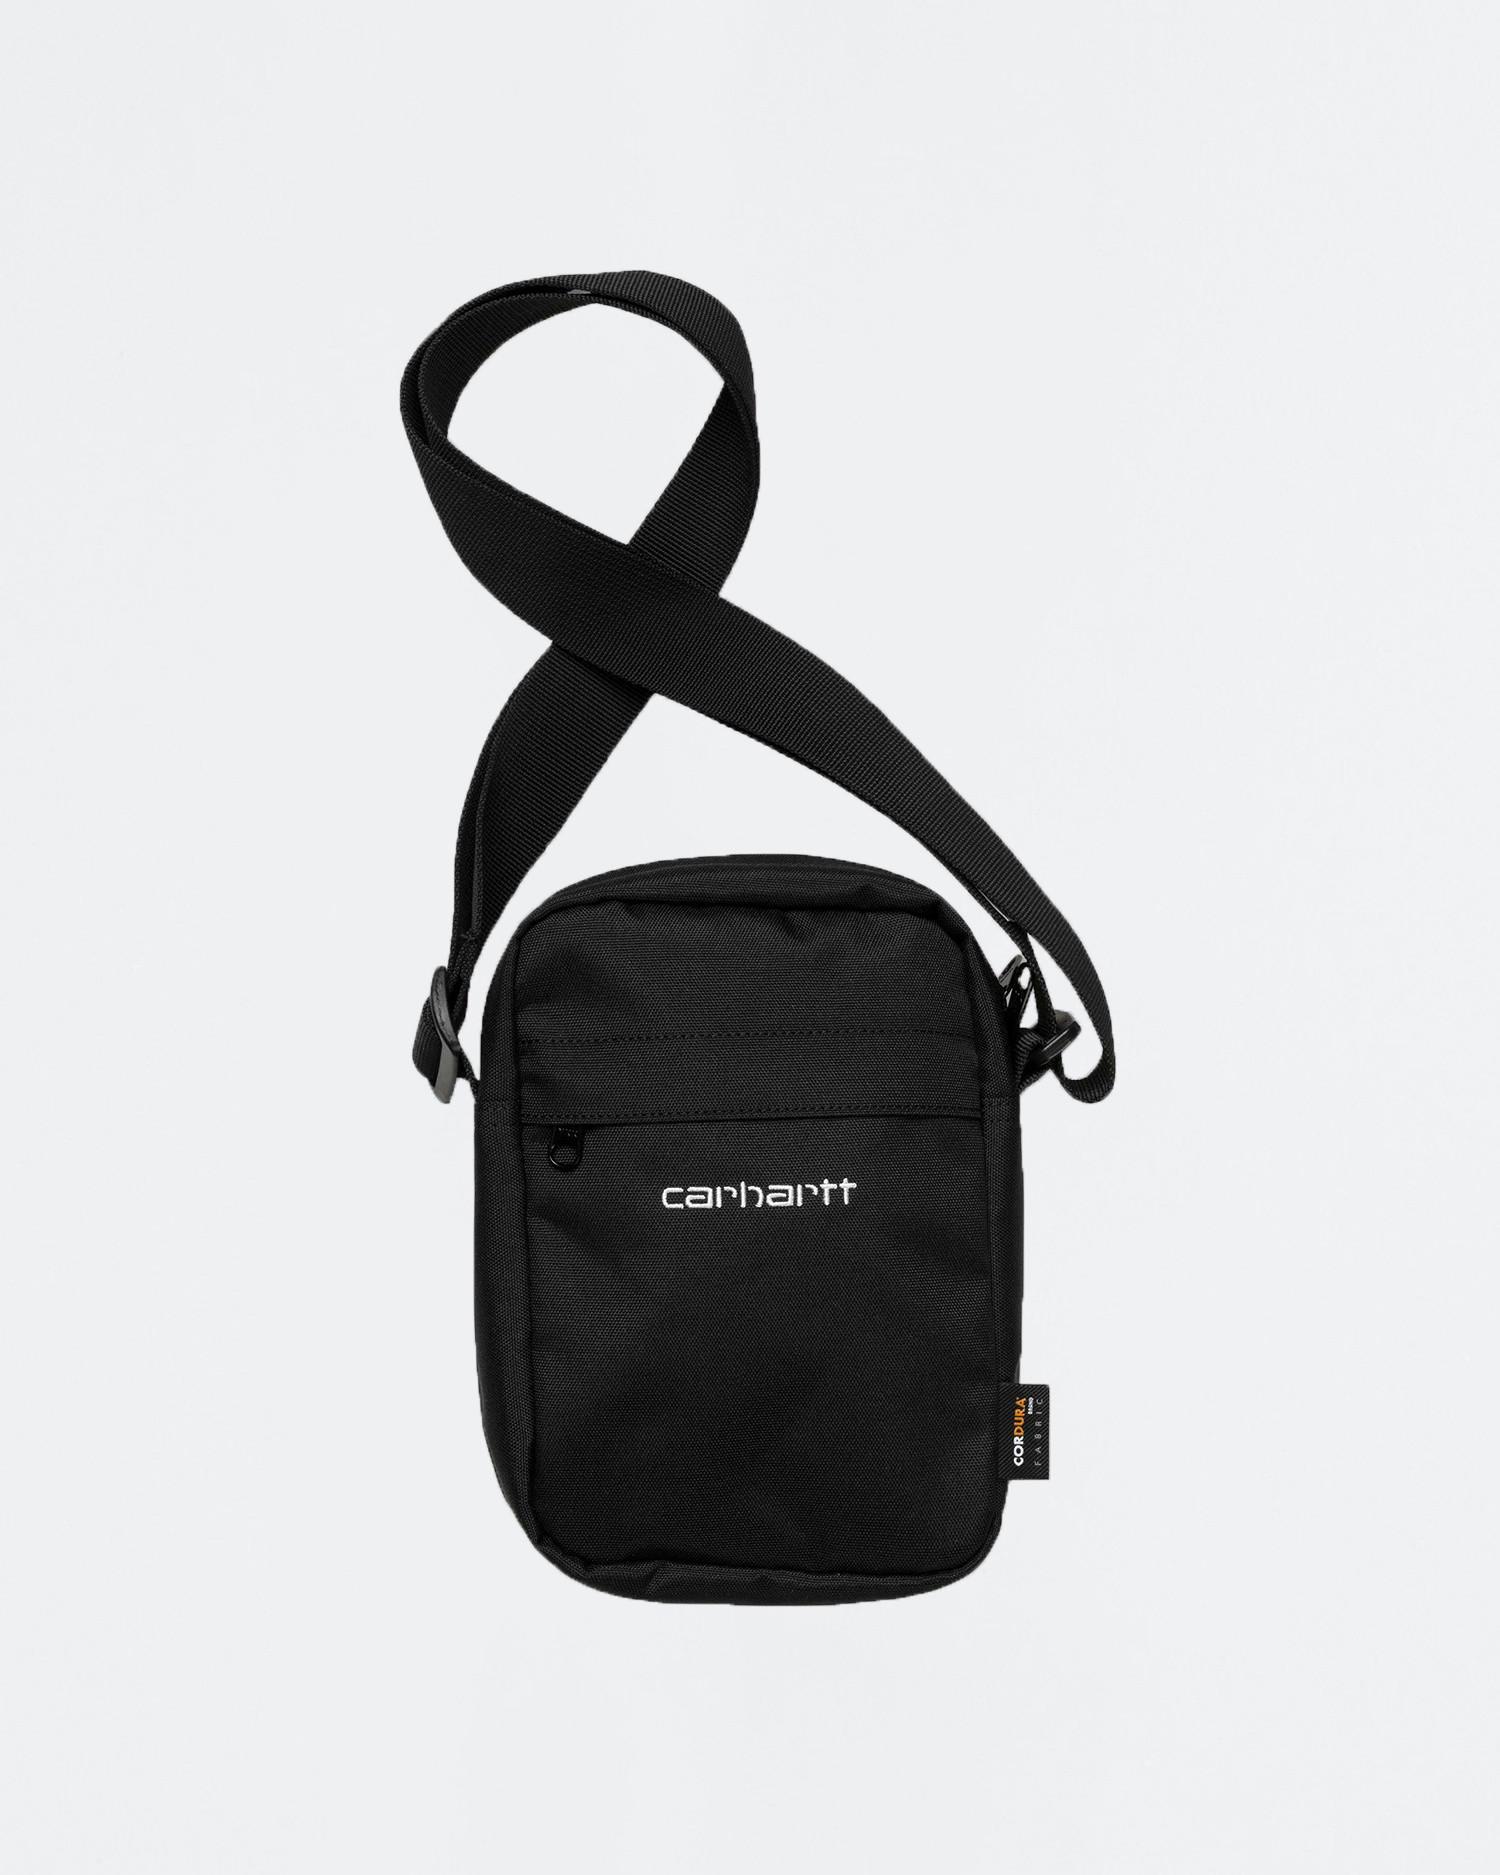 Carhartt Payton Shoulder Pouch Black/white